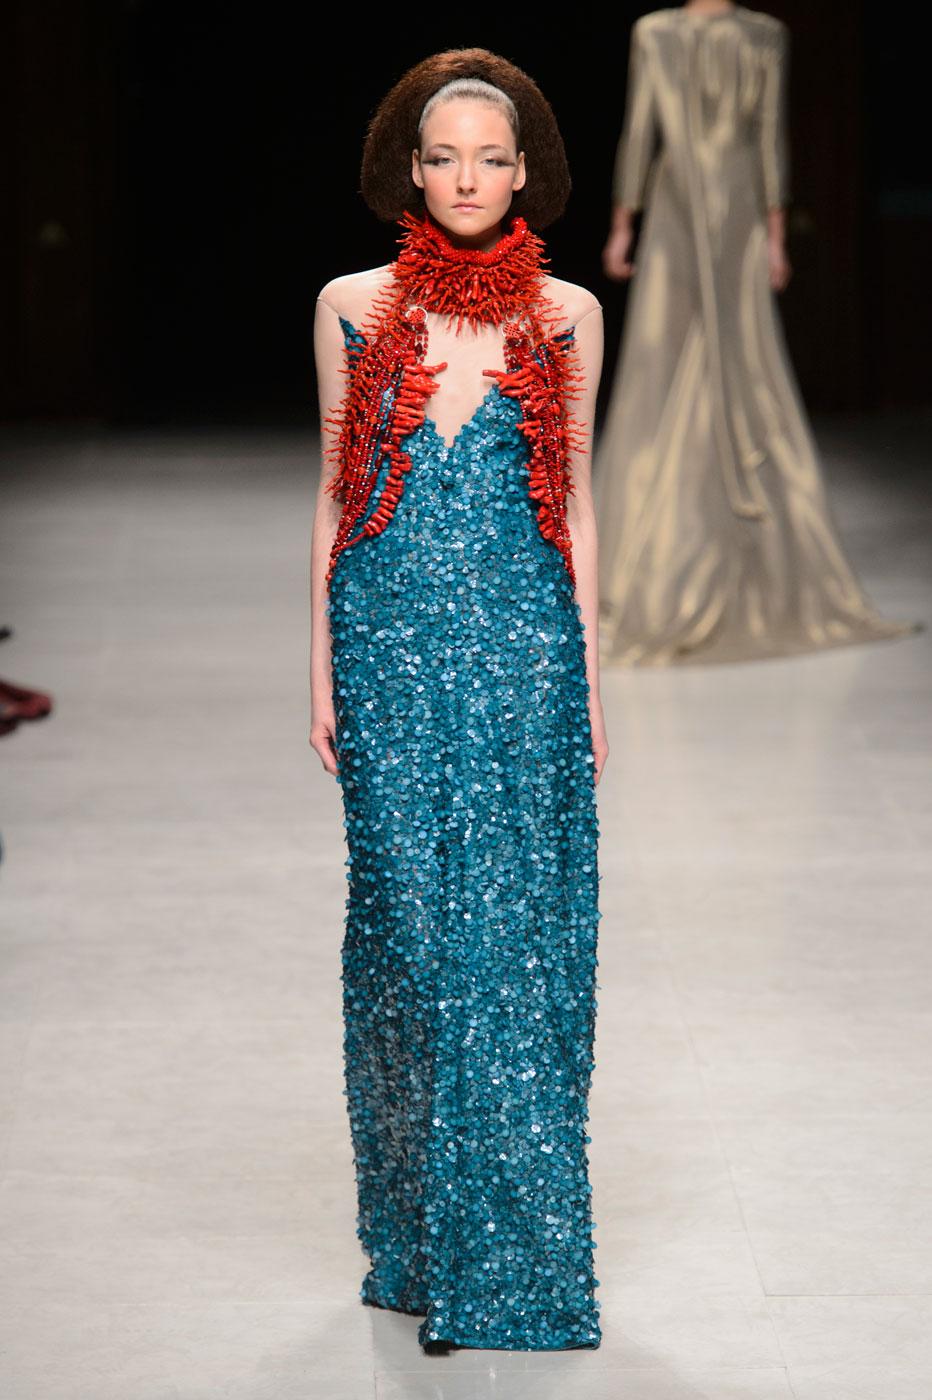 Julien-Fournie-Prive-fashion-runway-show-haute-couture-paris-spring-2015-the-impression-44